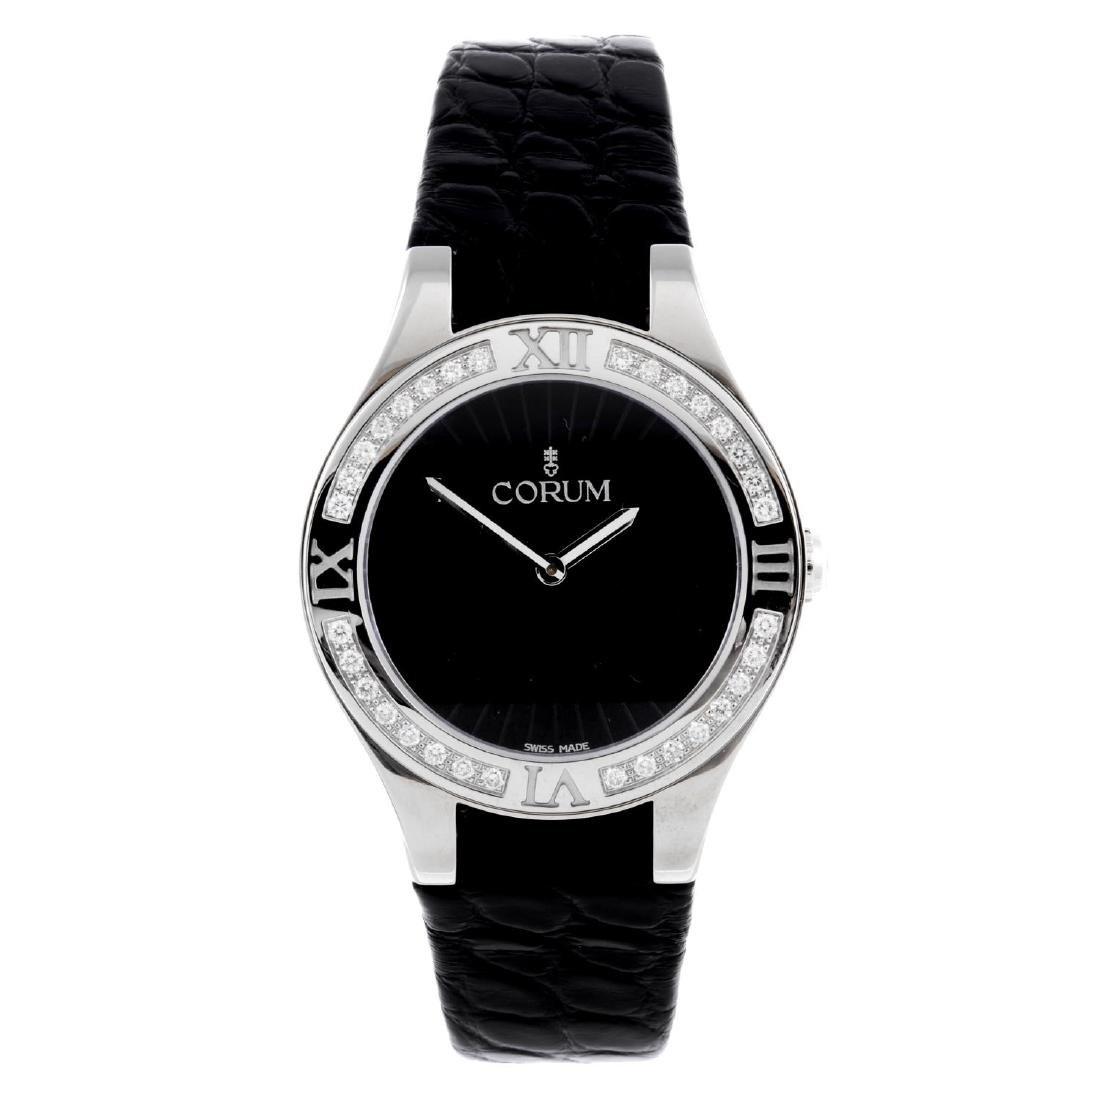 CORUM - a lady's Romulus wrist watch. Stainless steel